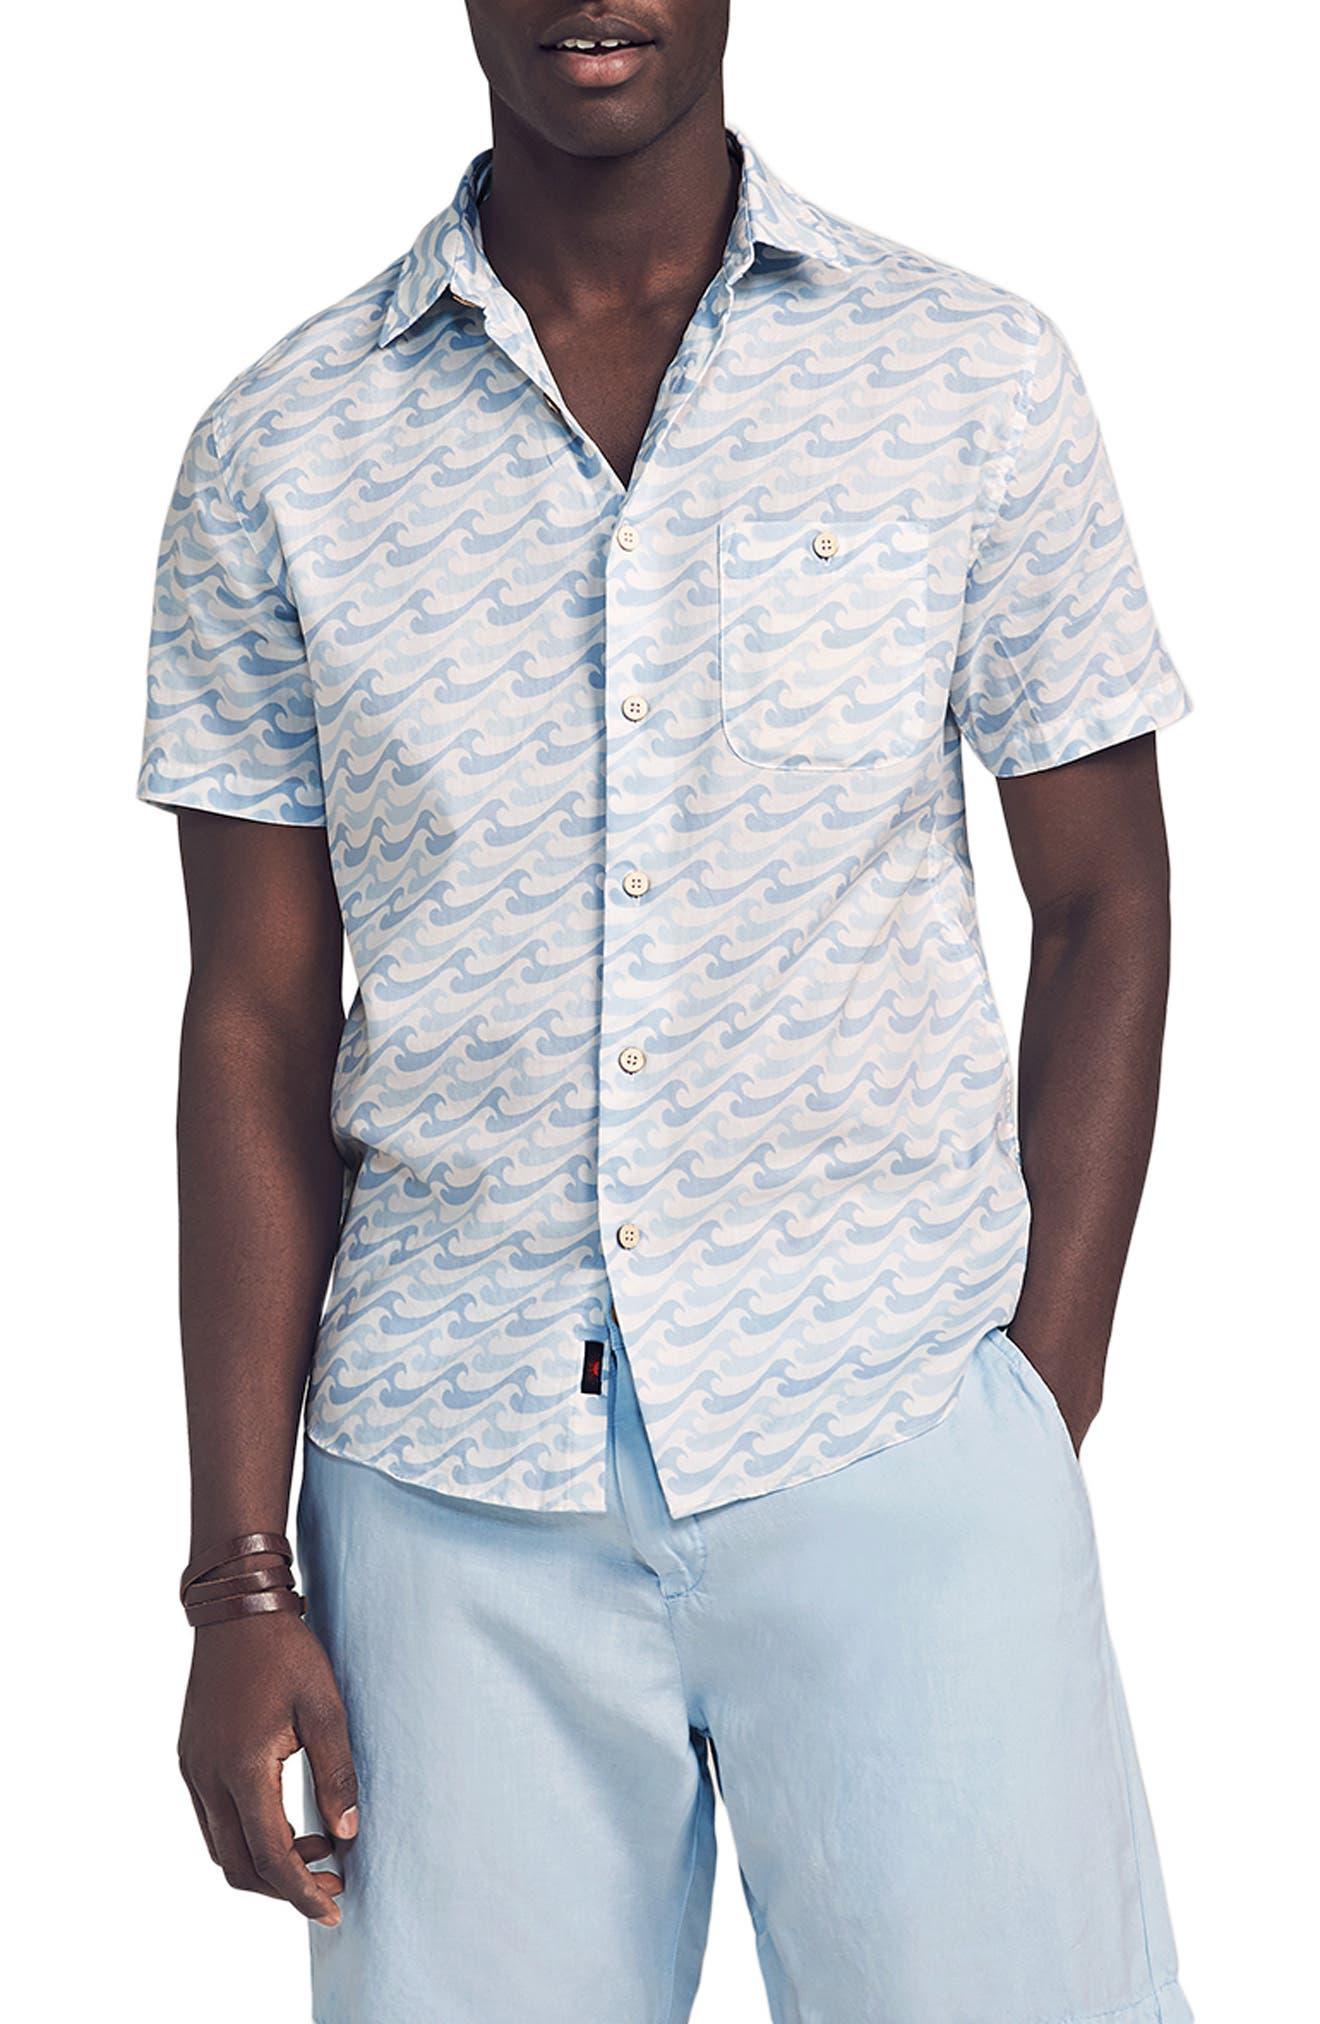 Playa Wave Print Short Sleeve Button-Up Shirt